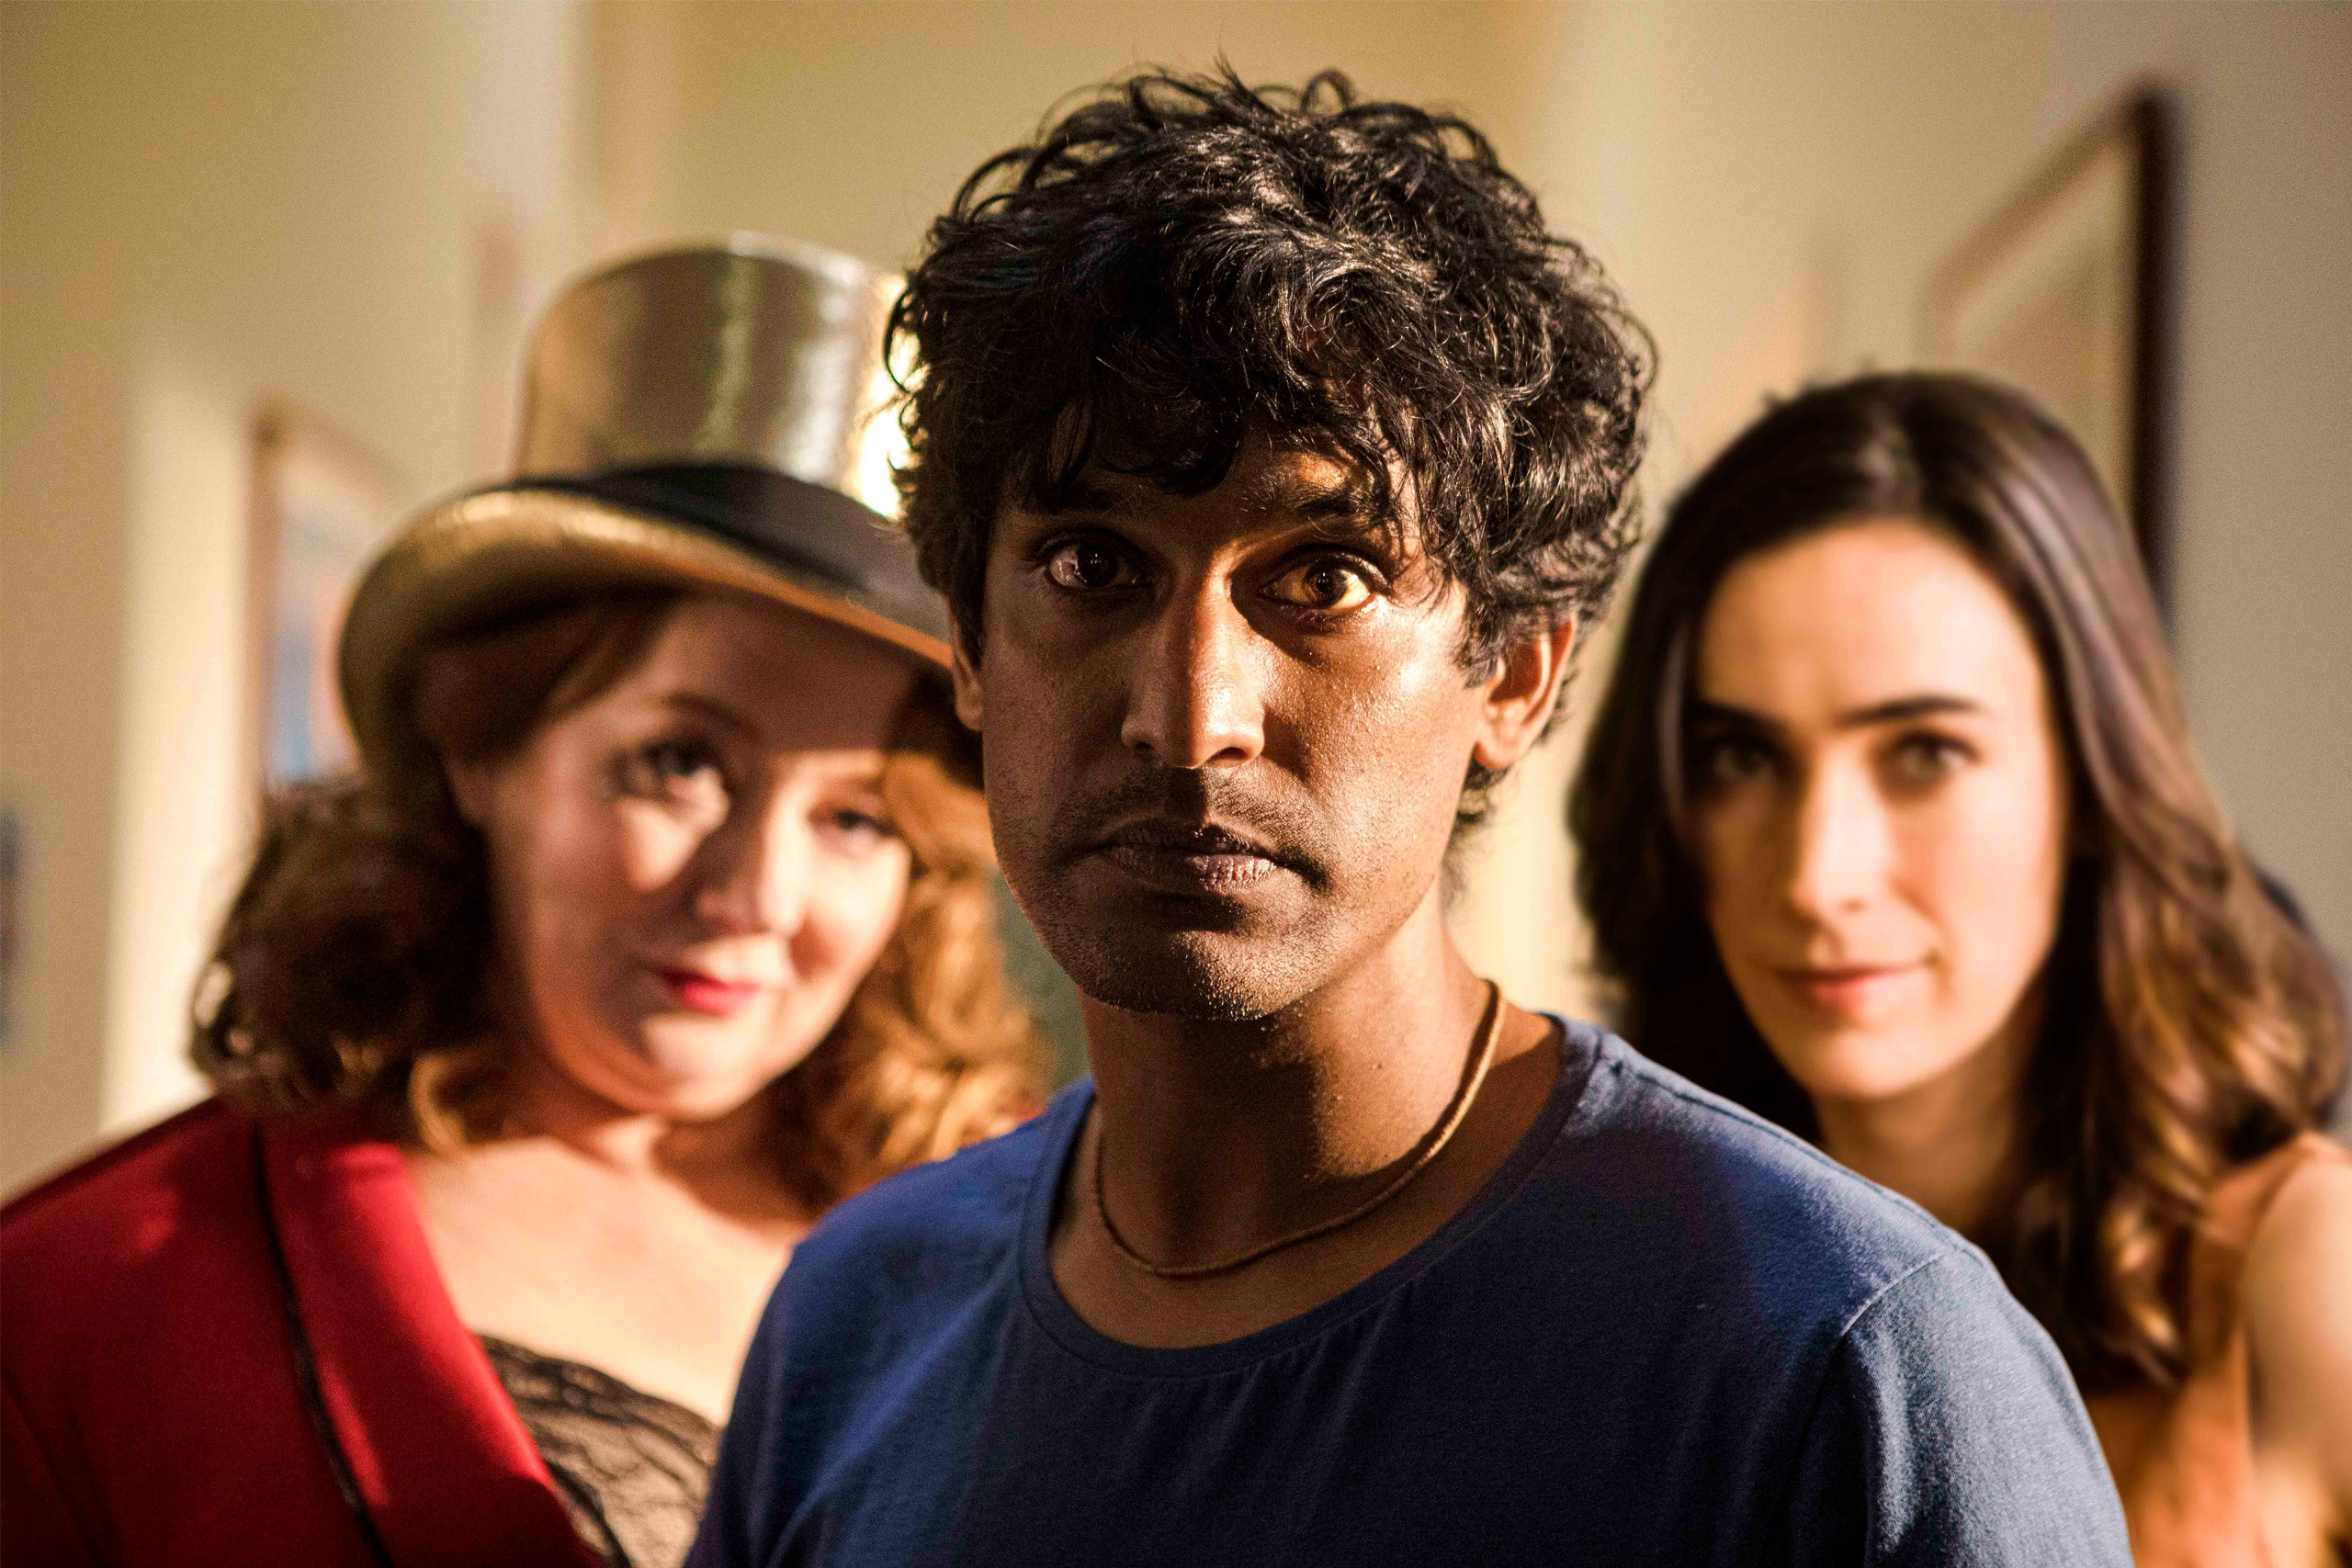 abc wakefield best australian film tv shows 2021 so far@2560x1707.